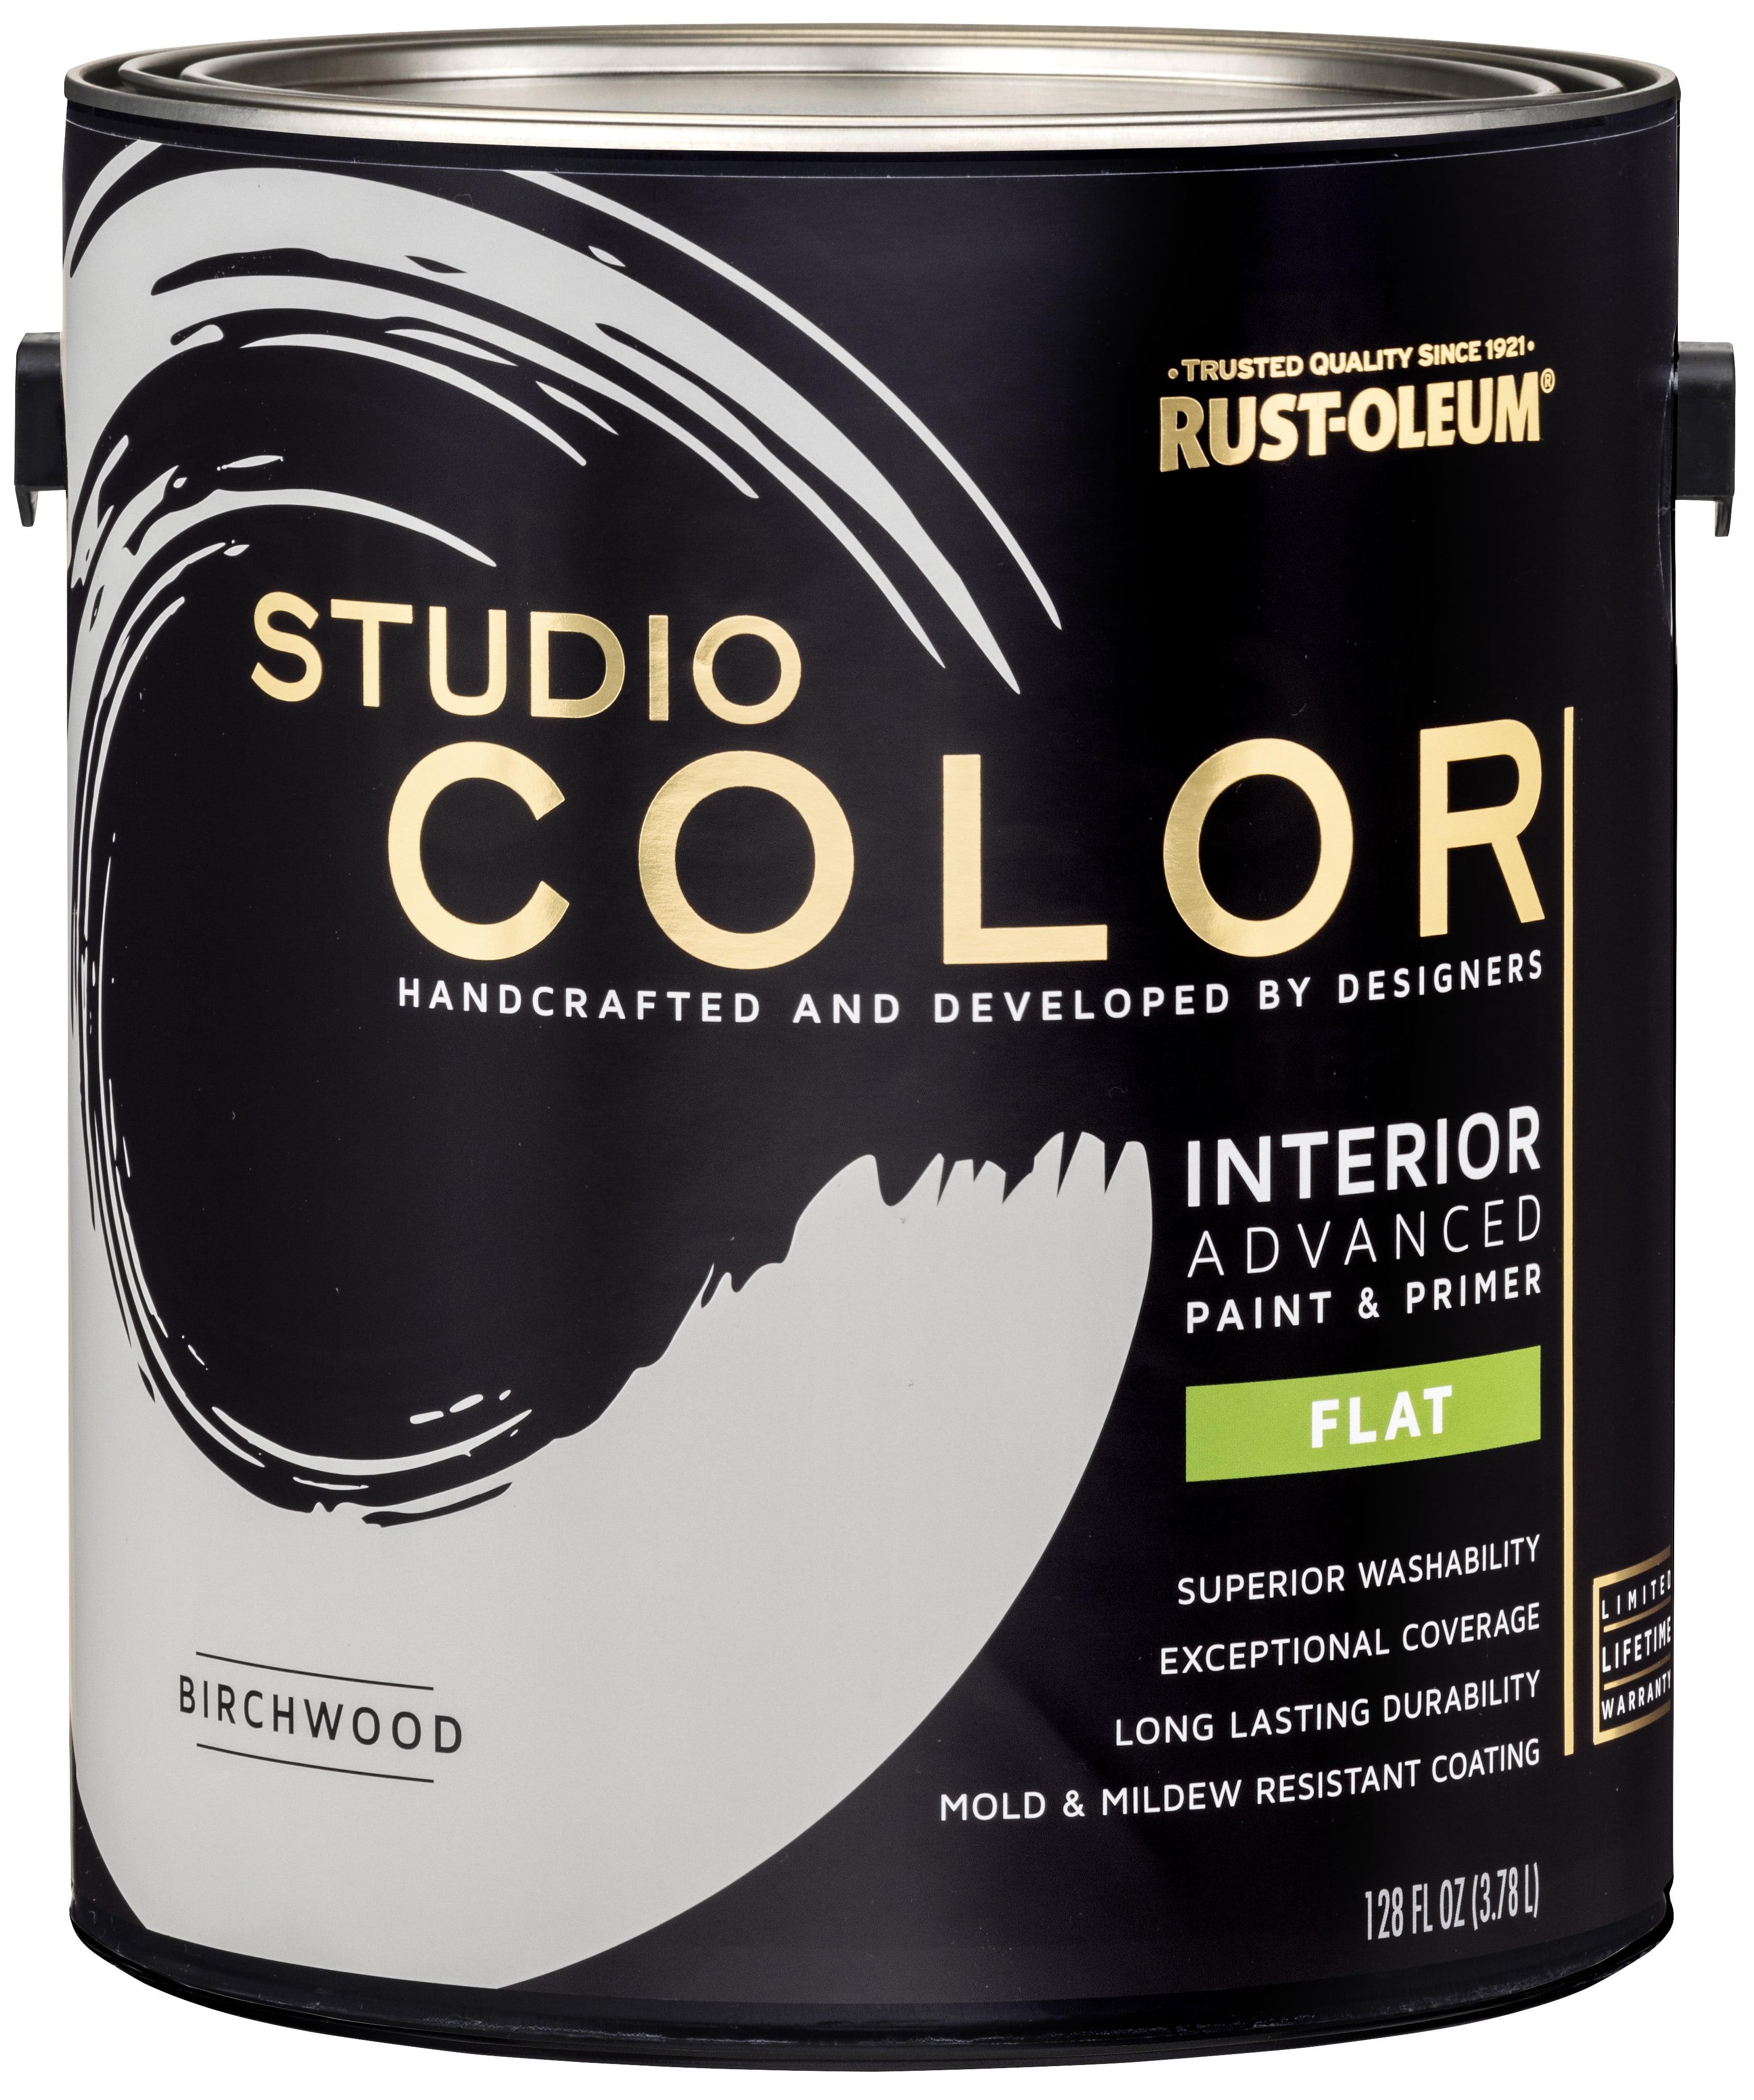 Glidden High Endurance Plus Grab N Go Semi Gloss Interior Paint Primer Country White 29 0 Fl Oz Walmart Com Walmart Com